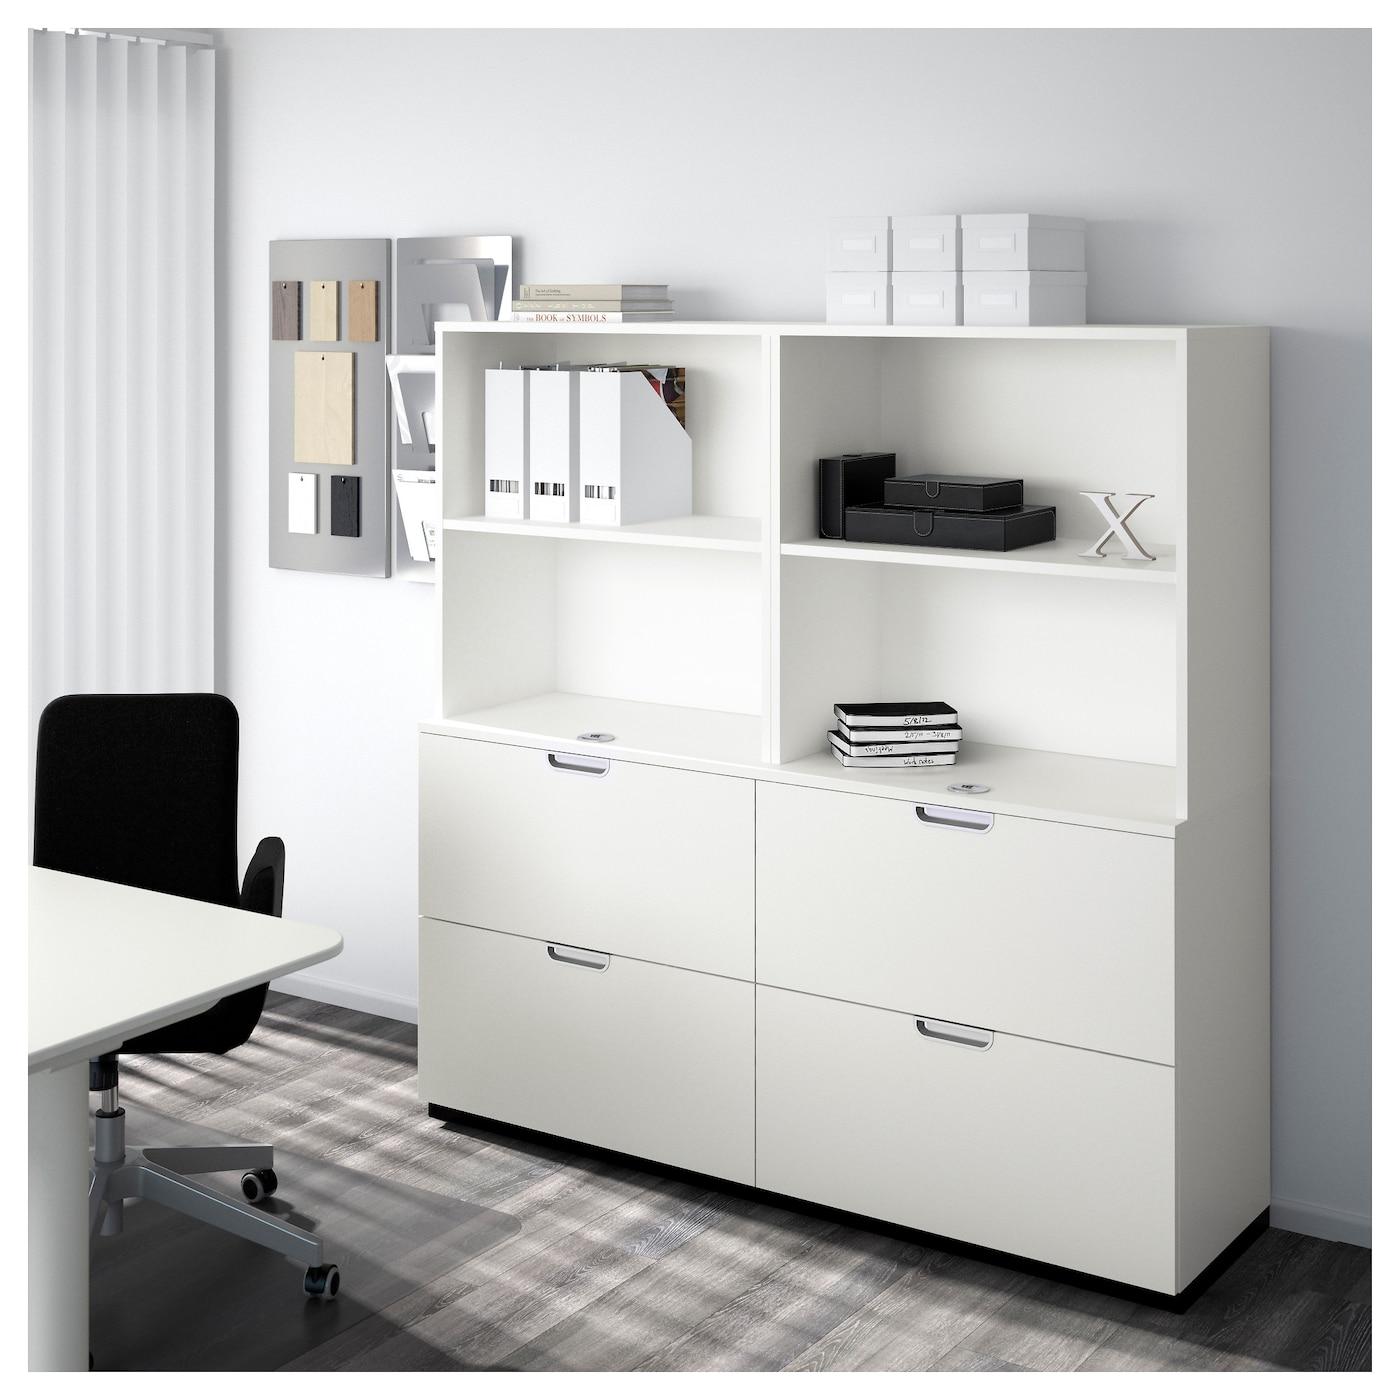 galant combinaison rangements av dossiers blanc 160x160 cm ikea. Black Bedroom Furniture Sets. Home Design Ideas